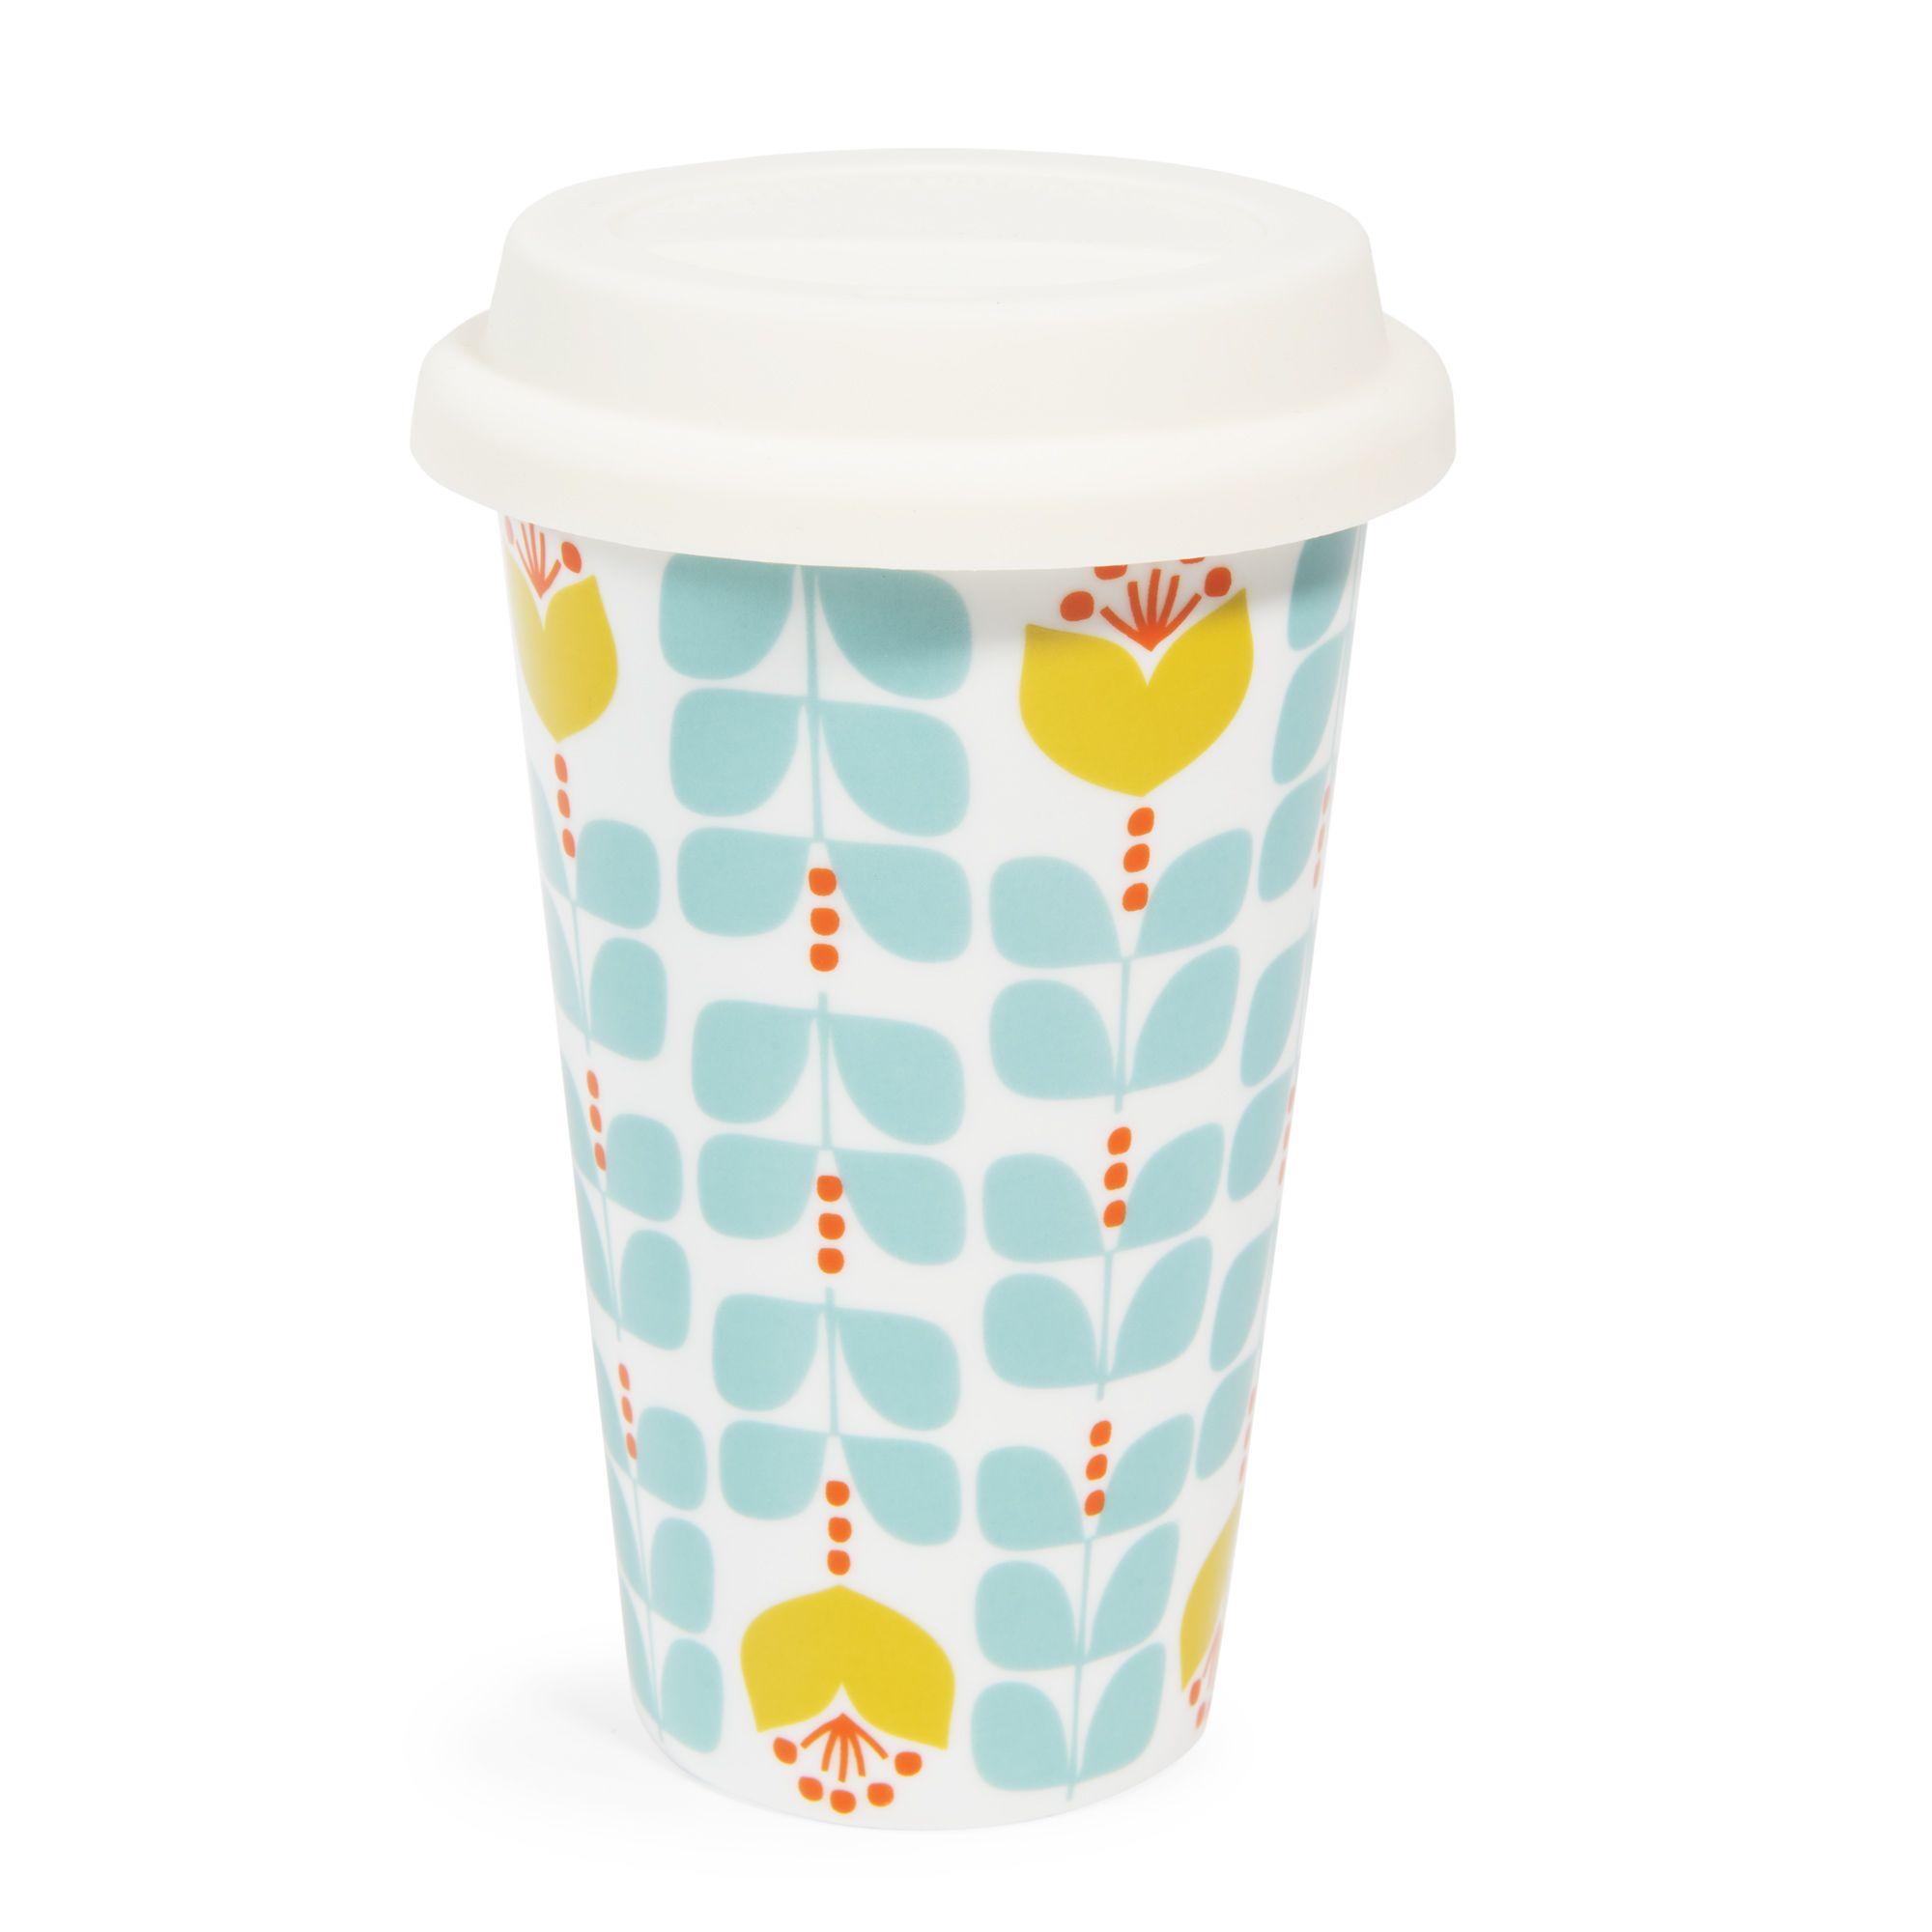 Mug da viaggio in porcellana blu verde brigitte products - Maison du monde mug ...